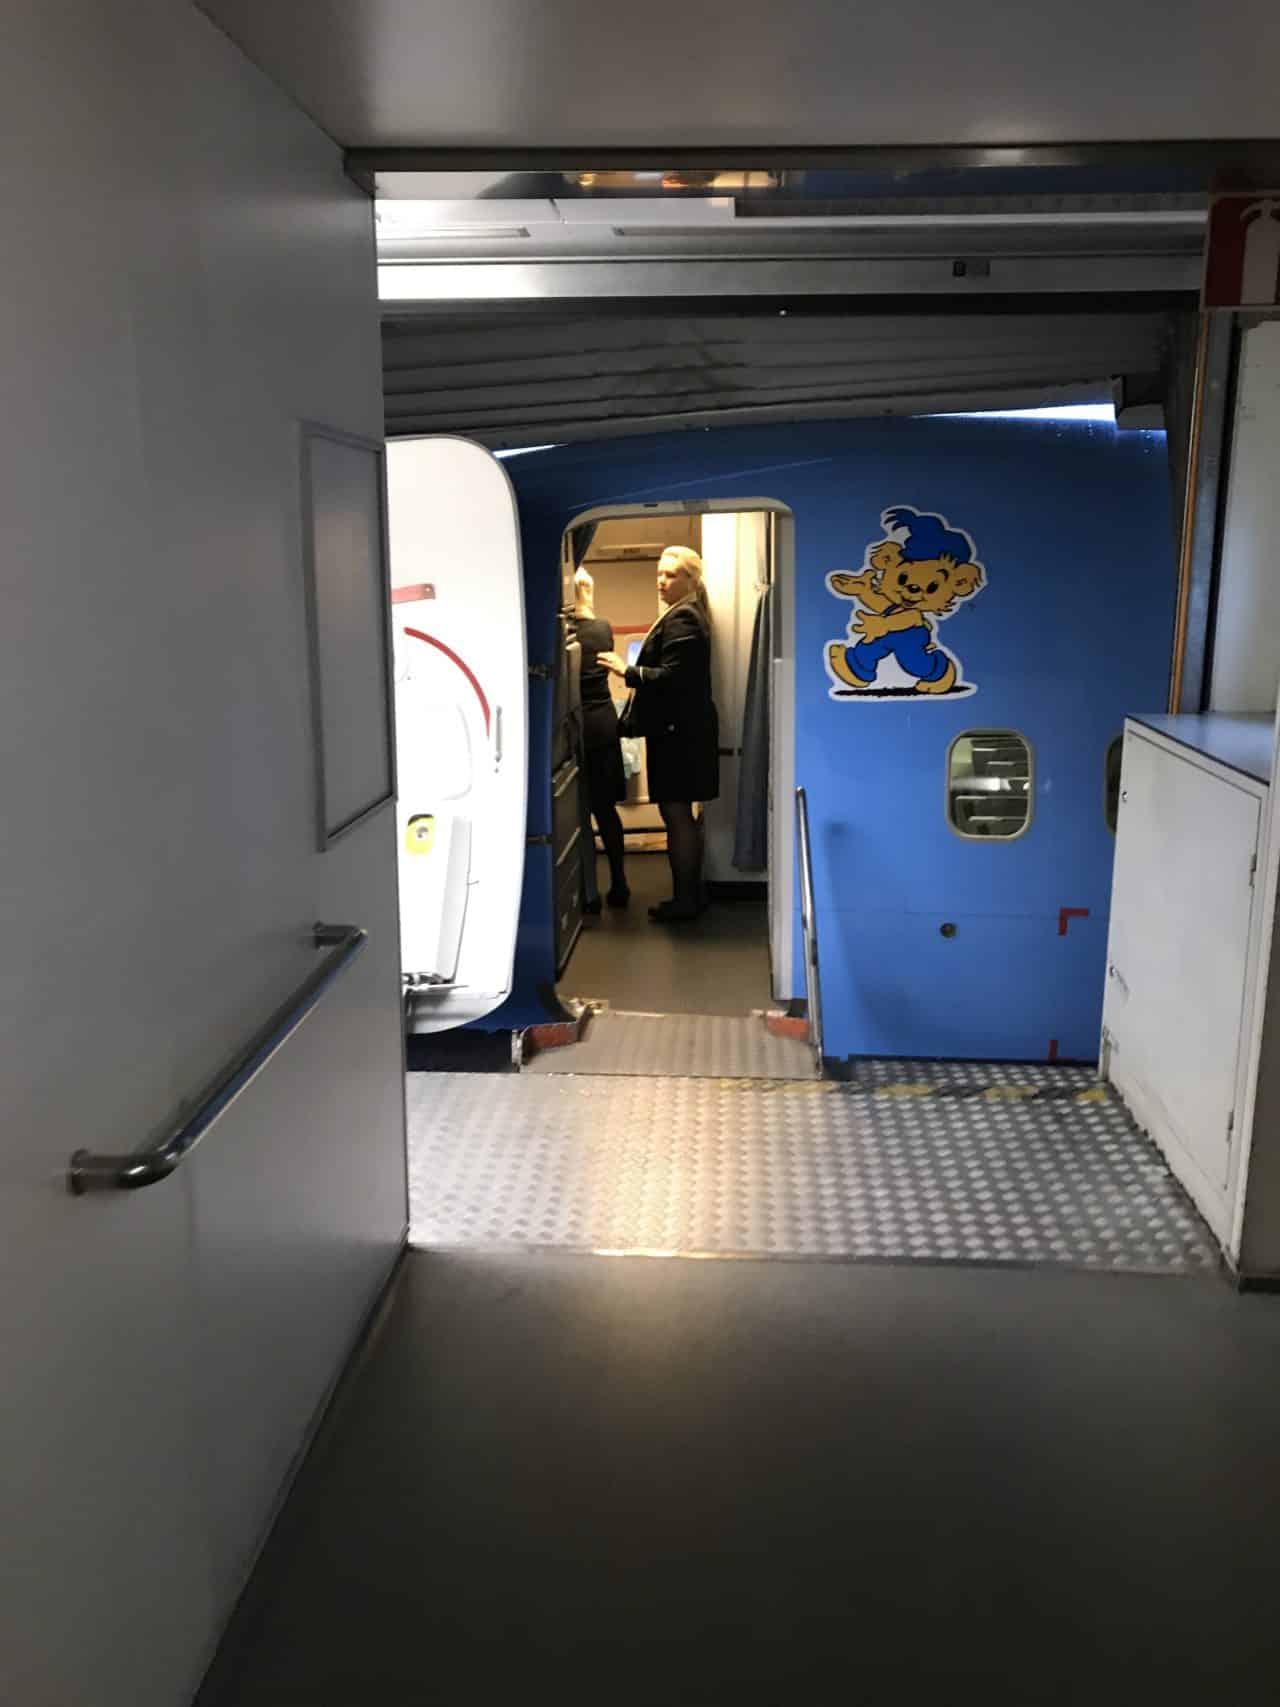 Boarding Walkway Leading To Airplane Door